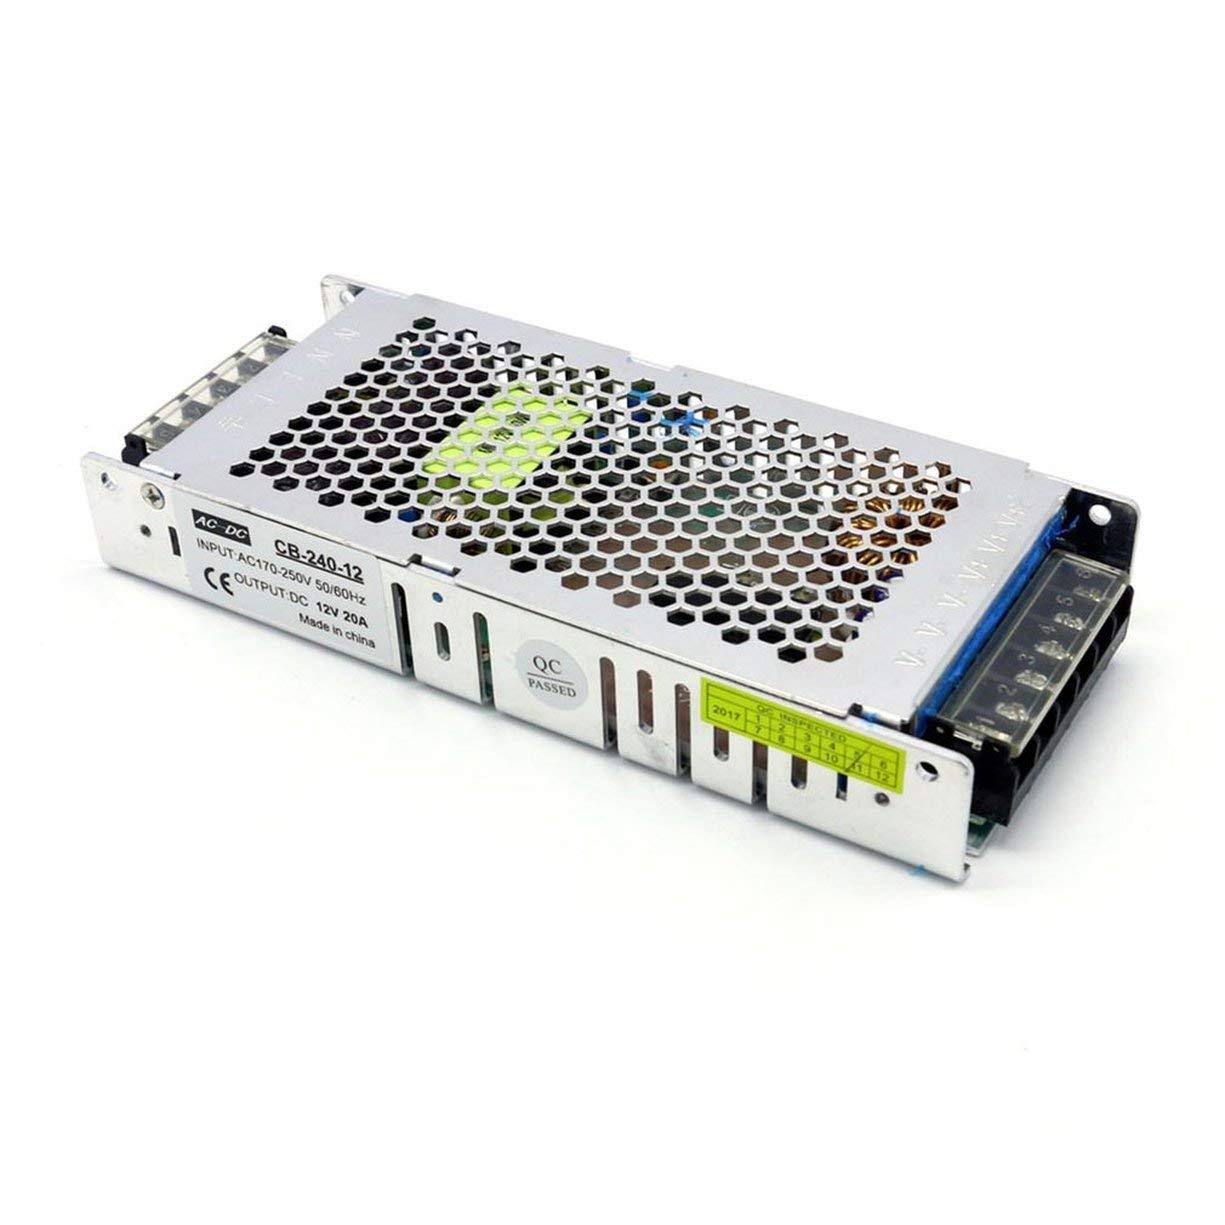 Ultradünne 12 V 20A 250 Watt AC-DC Schaltnetzteil LED-Treiber DC Transformator AC170V-250V 50 / 60Hz für LED-Streifen